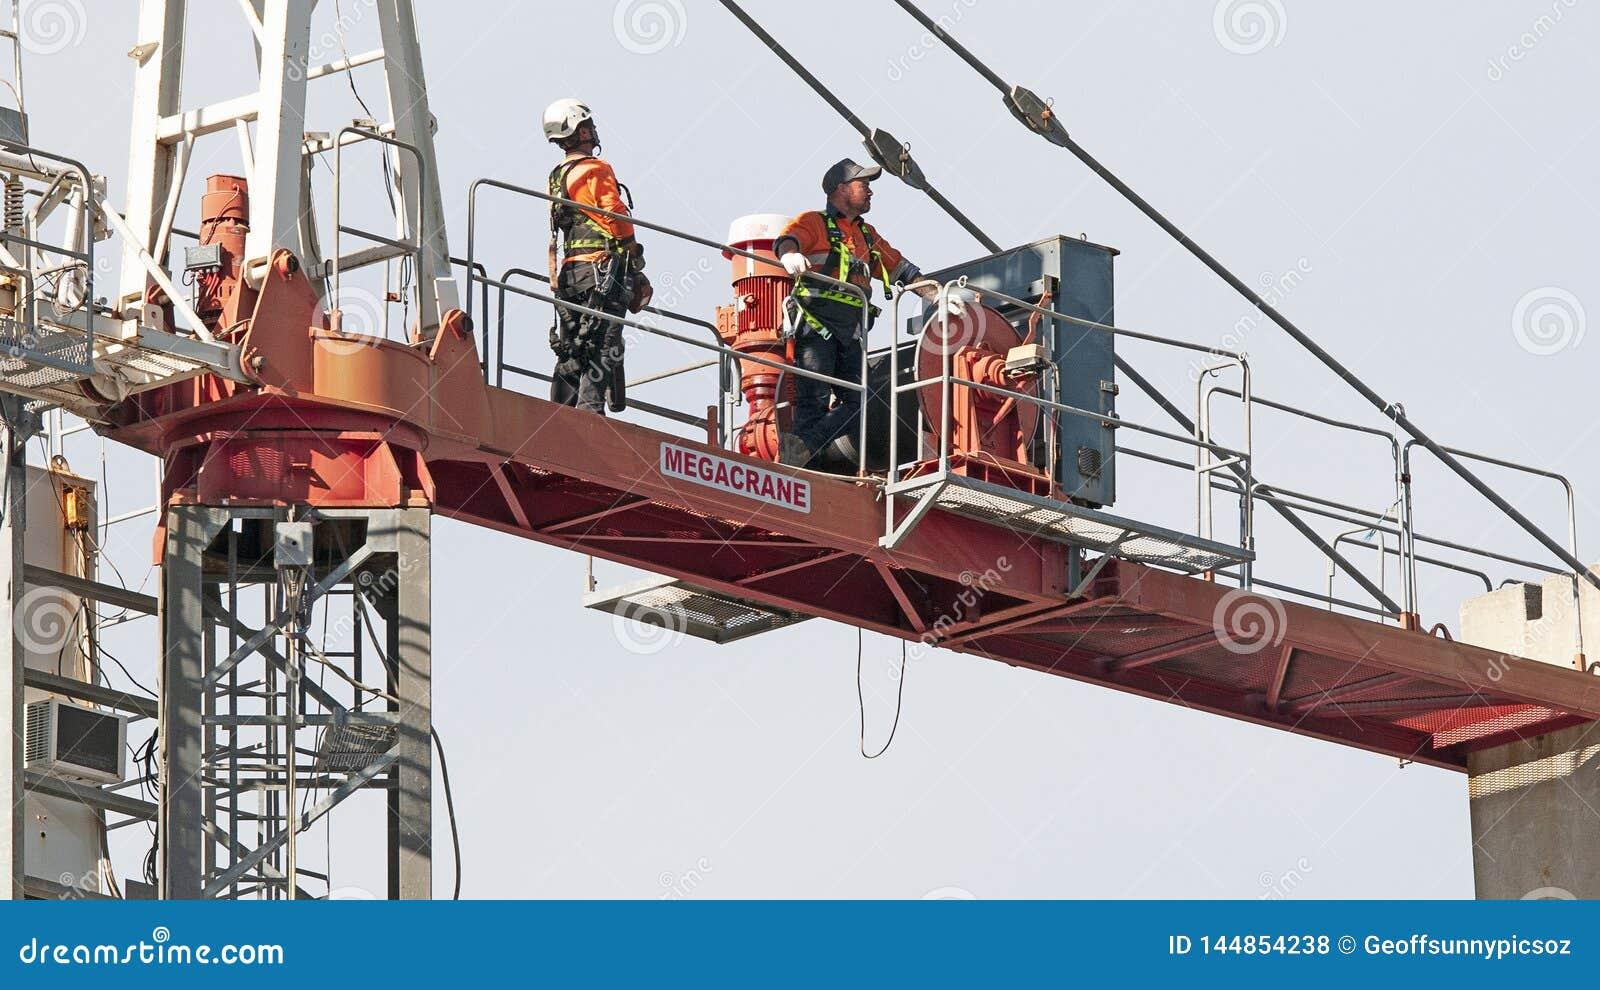 Construction crane removal. Update ed302. Gosford. April 9, 2019